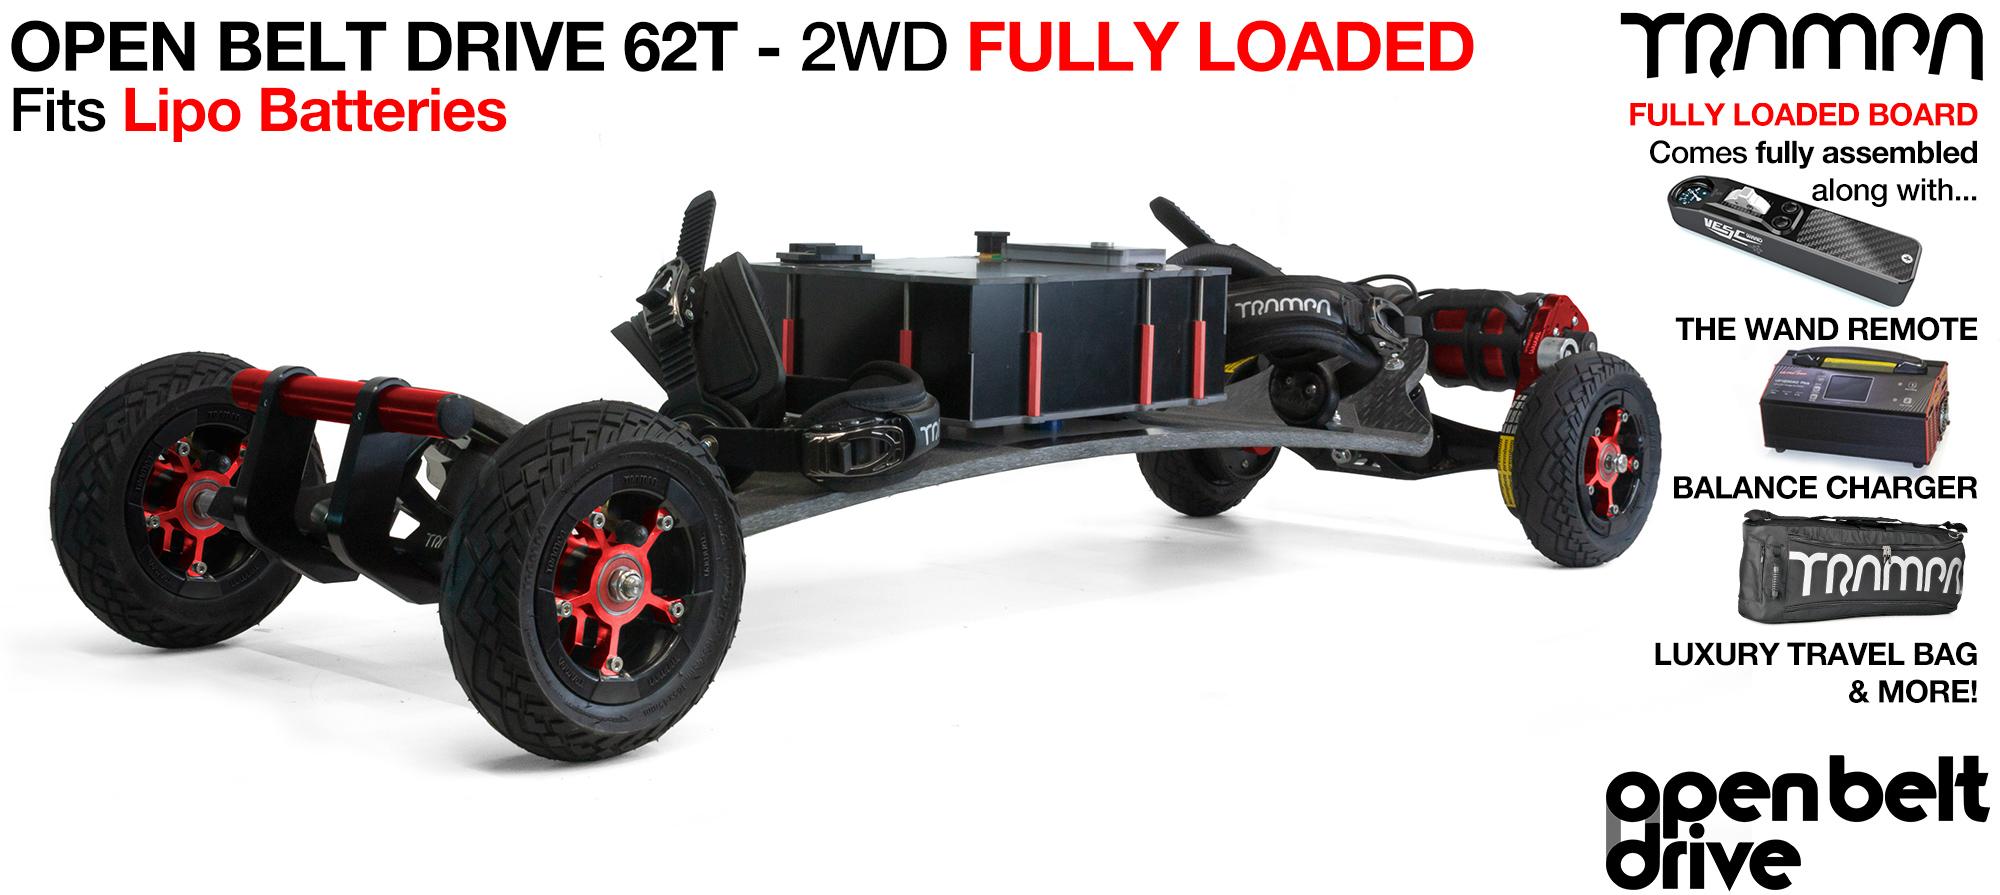 2WD 66T Open Belt Drive TRAMPA Electric Mountainboard with 6 Inch URBAN TREADs Wheels & 62 Tooth Pulleys - LOADED Li-Po